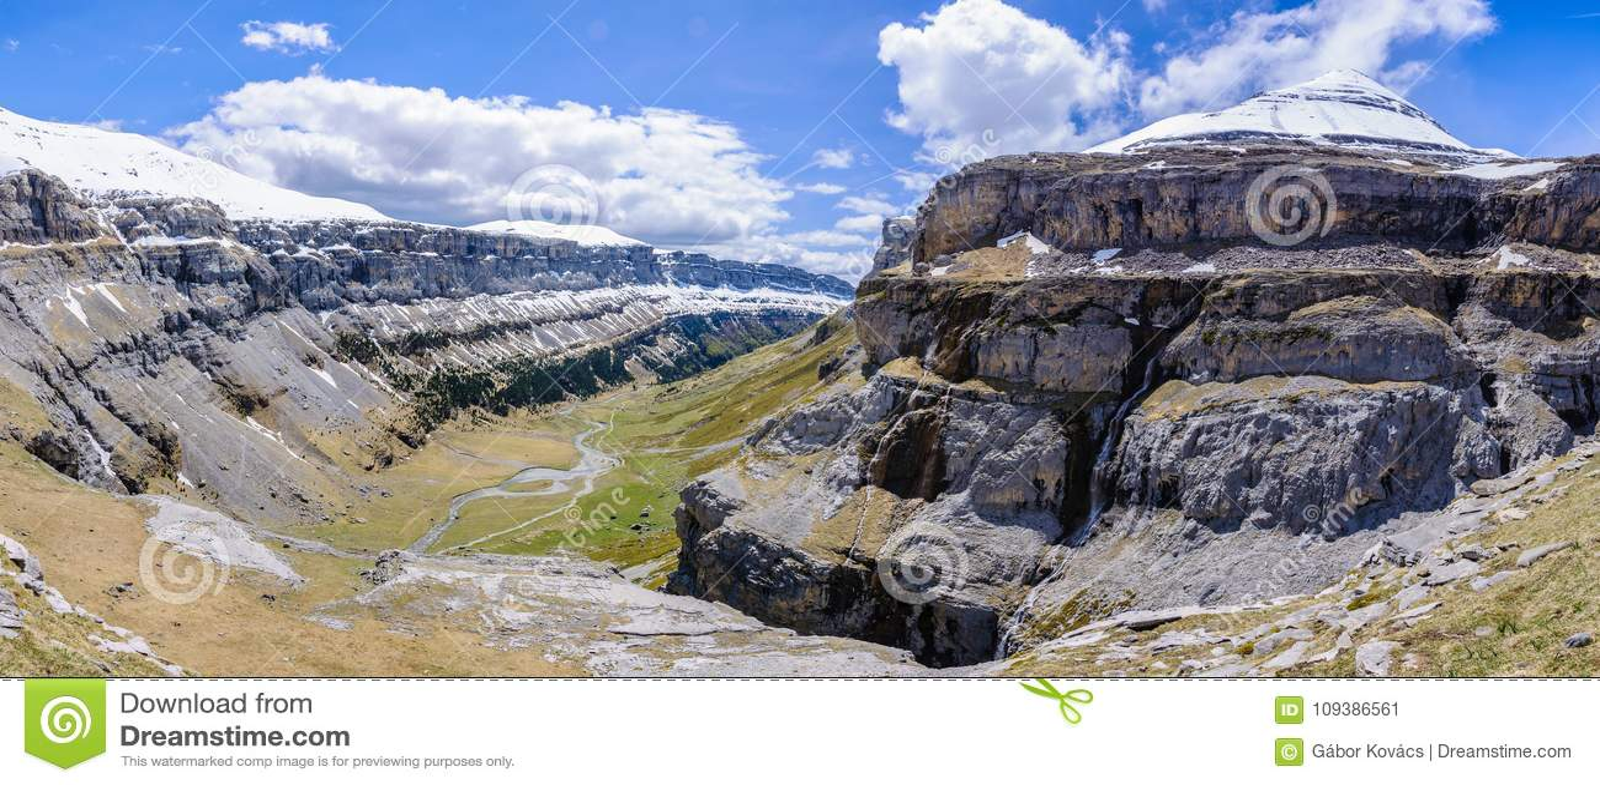 Vista panorâmica no vale de Ordesa, Aragon, Espanha